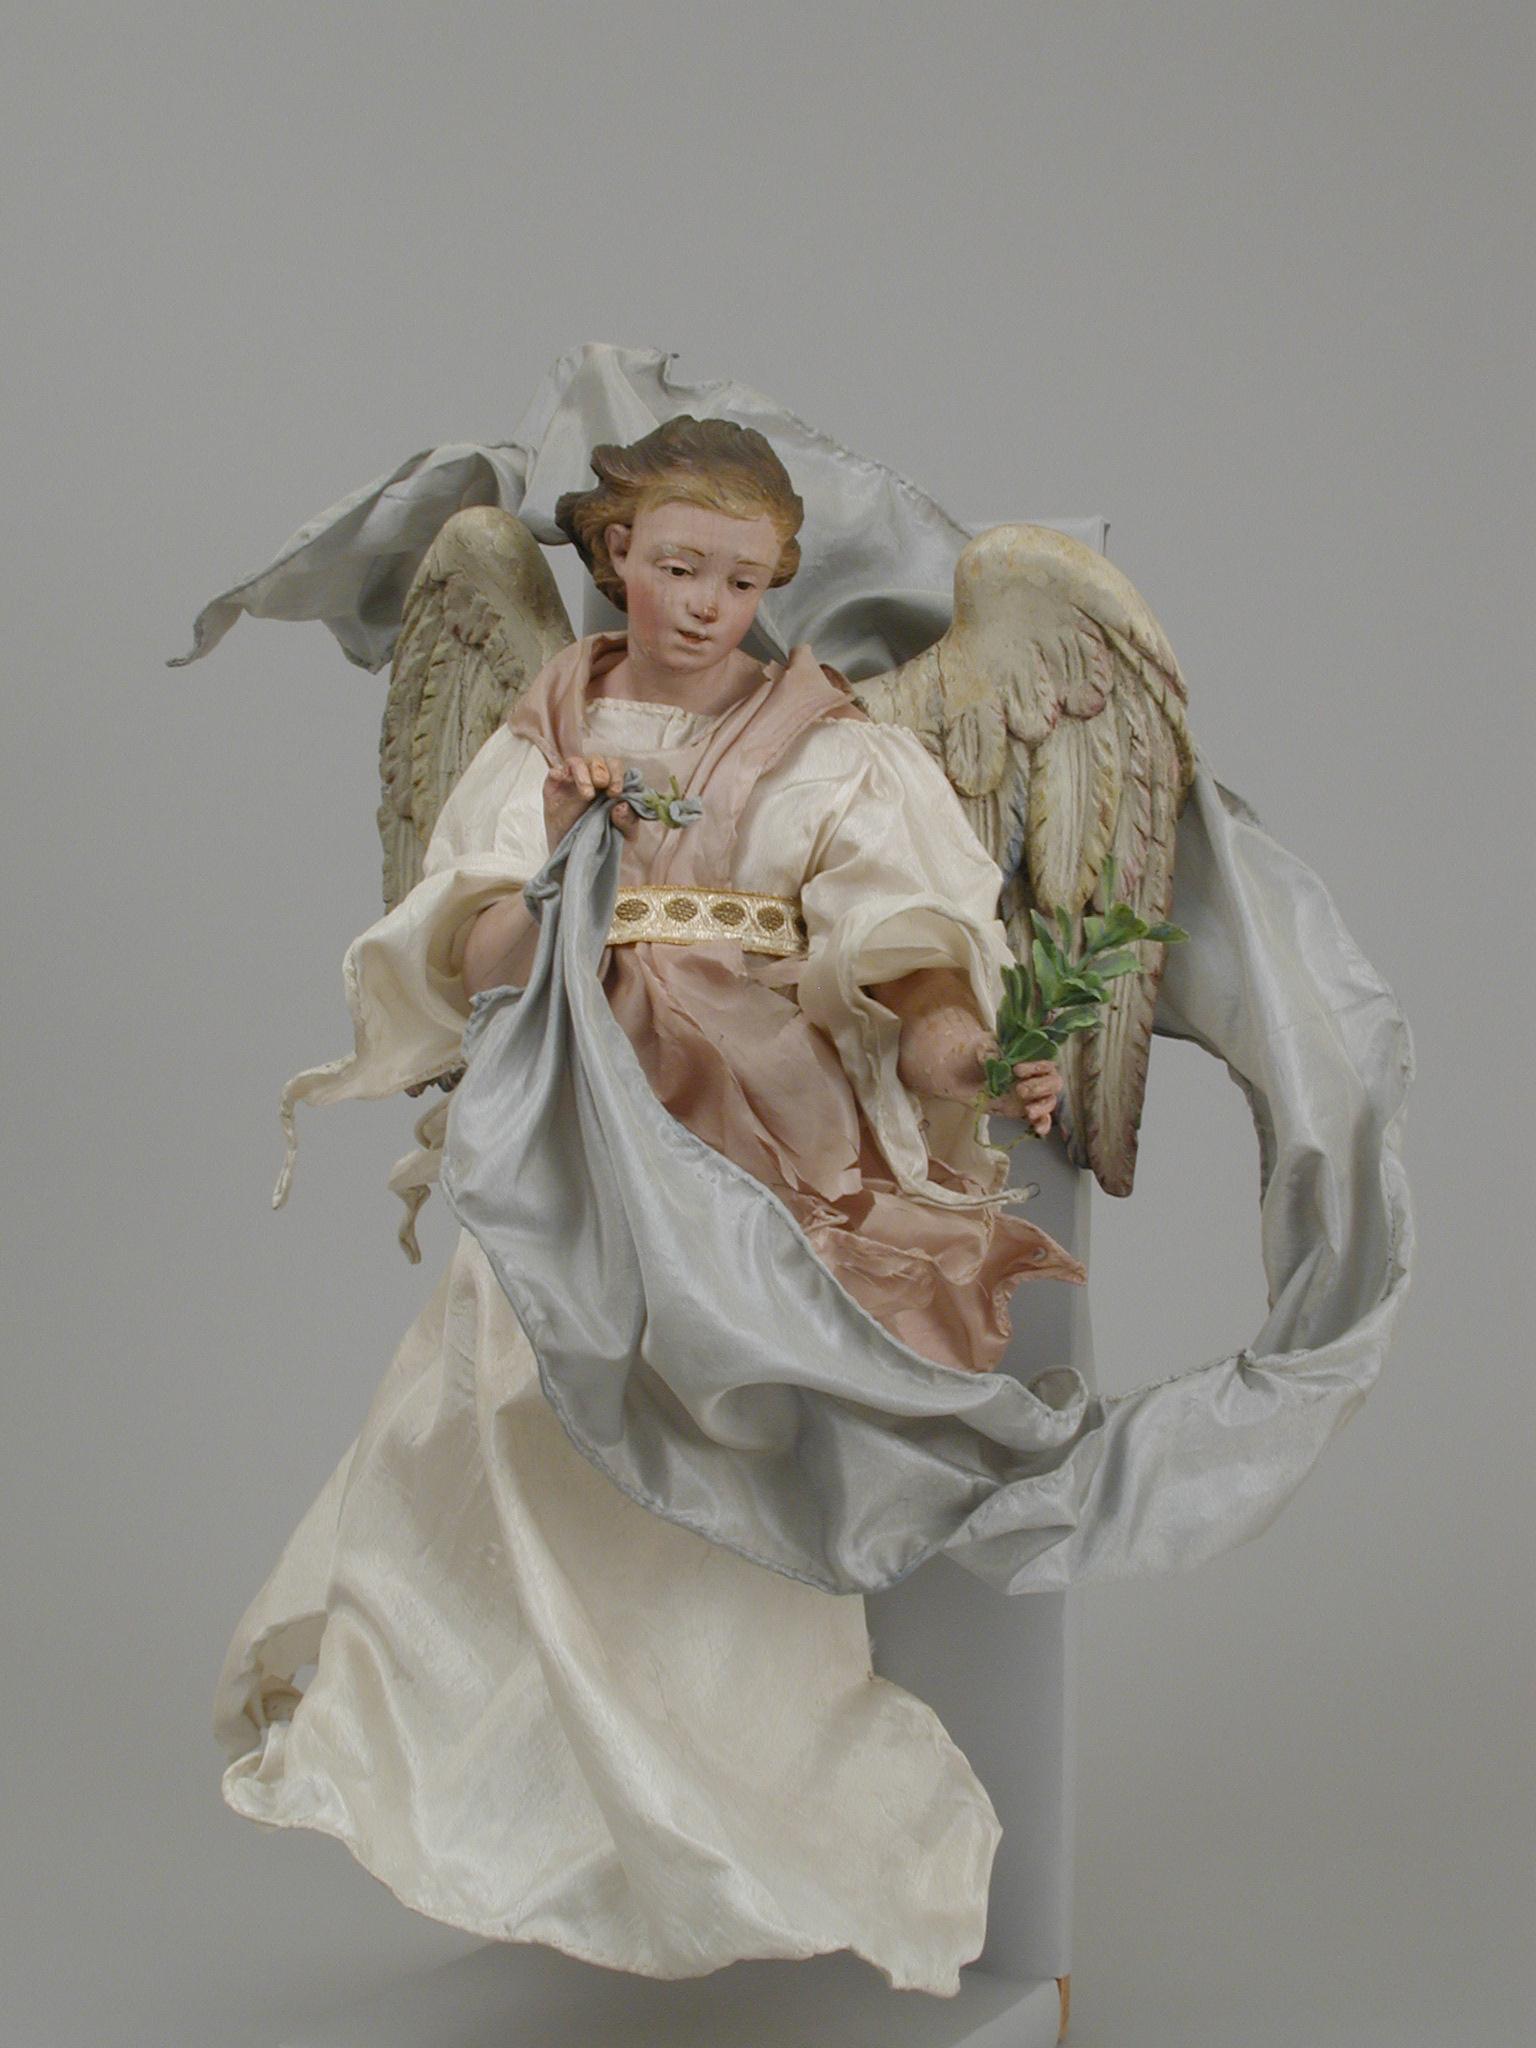 https://images.metmuseum.org/CRDImages/es/original/LC-69_294_15.jpg